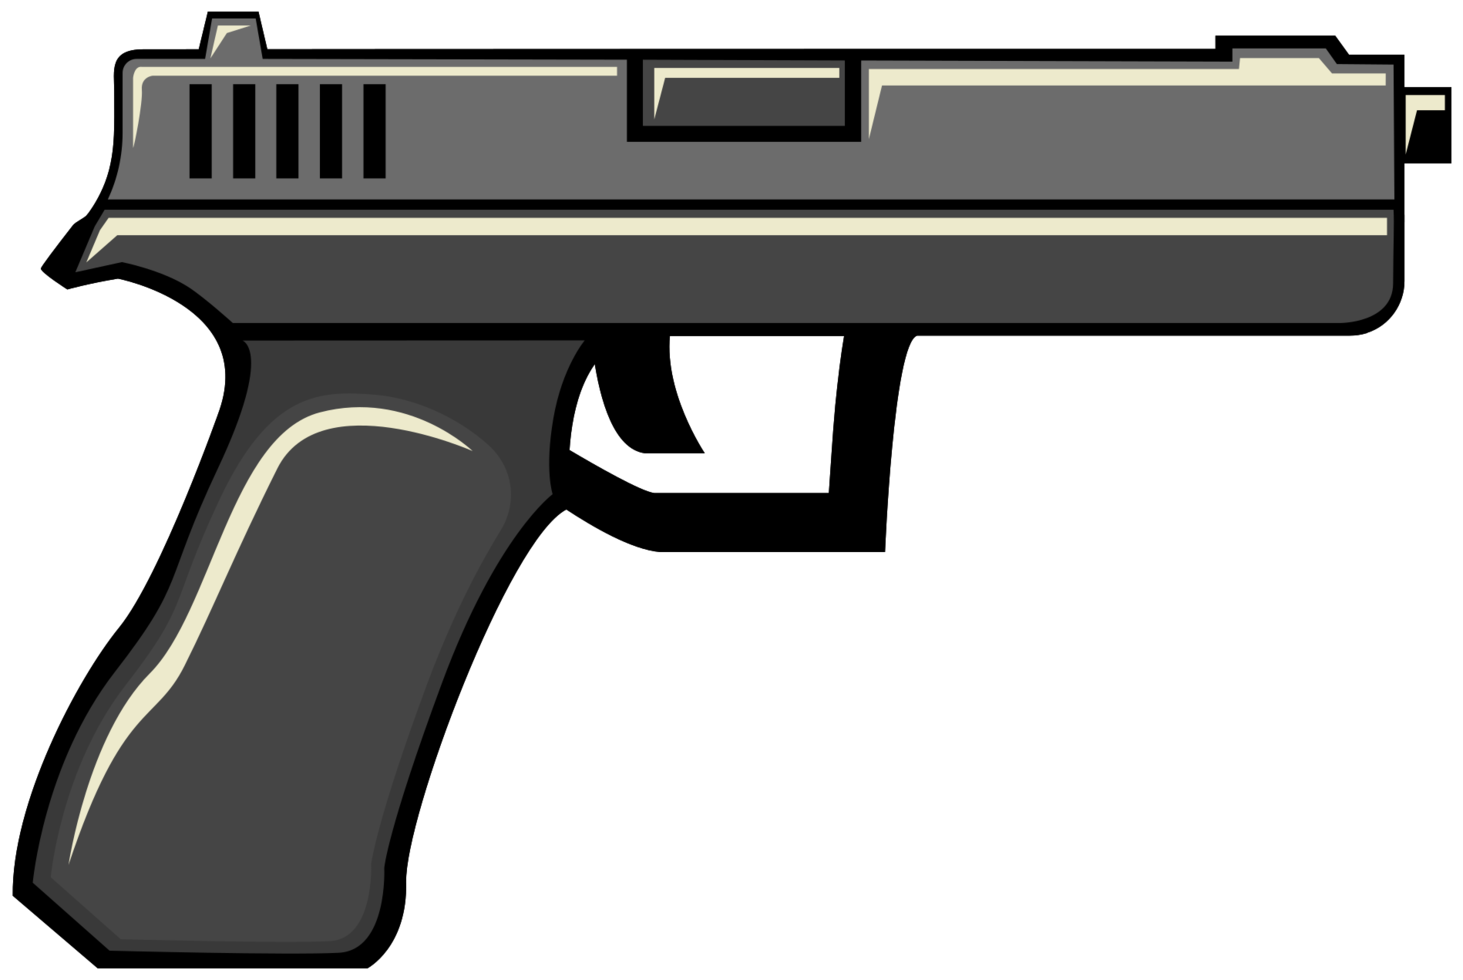 pistol png